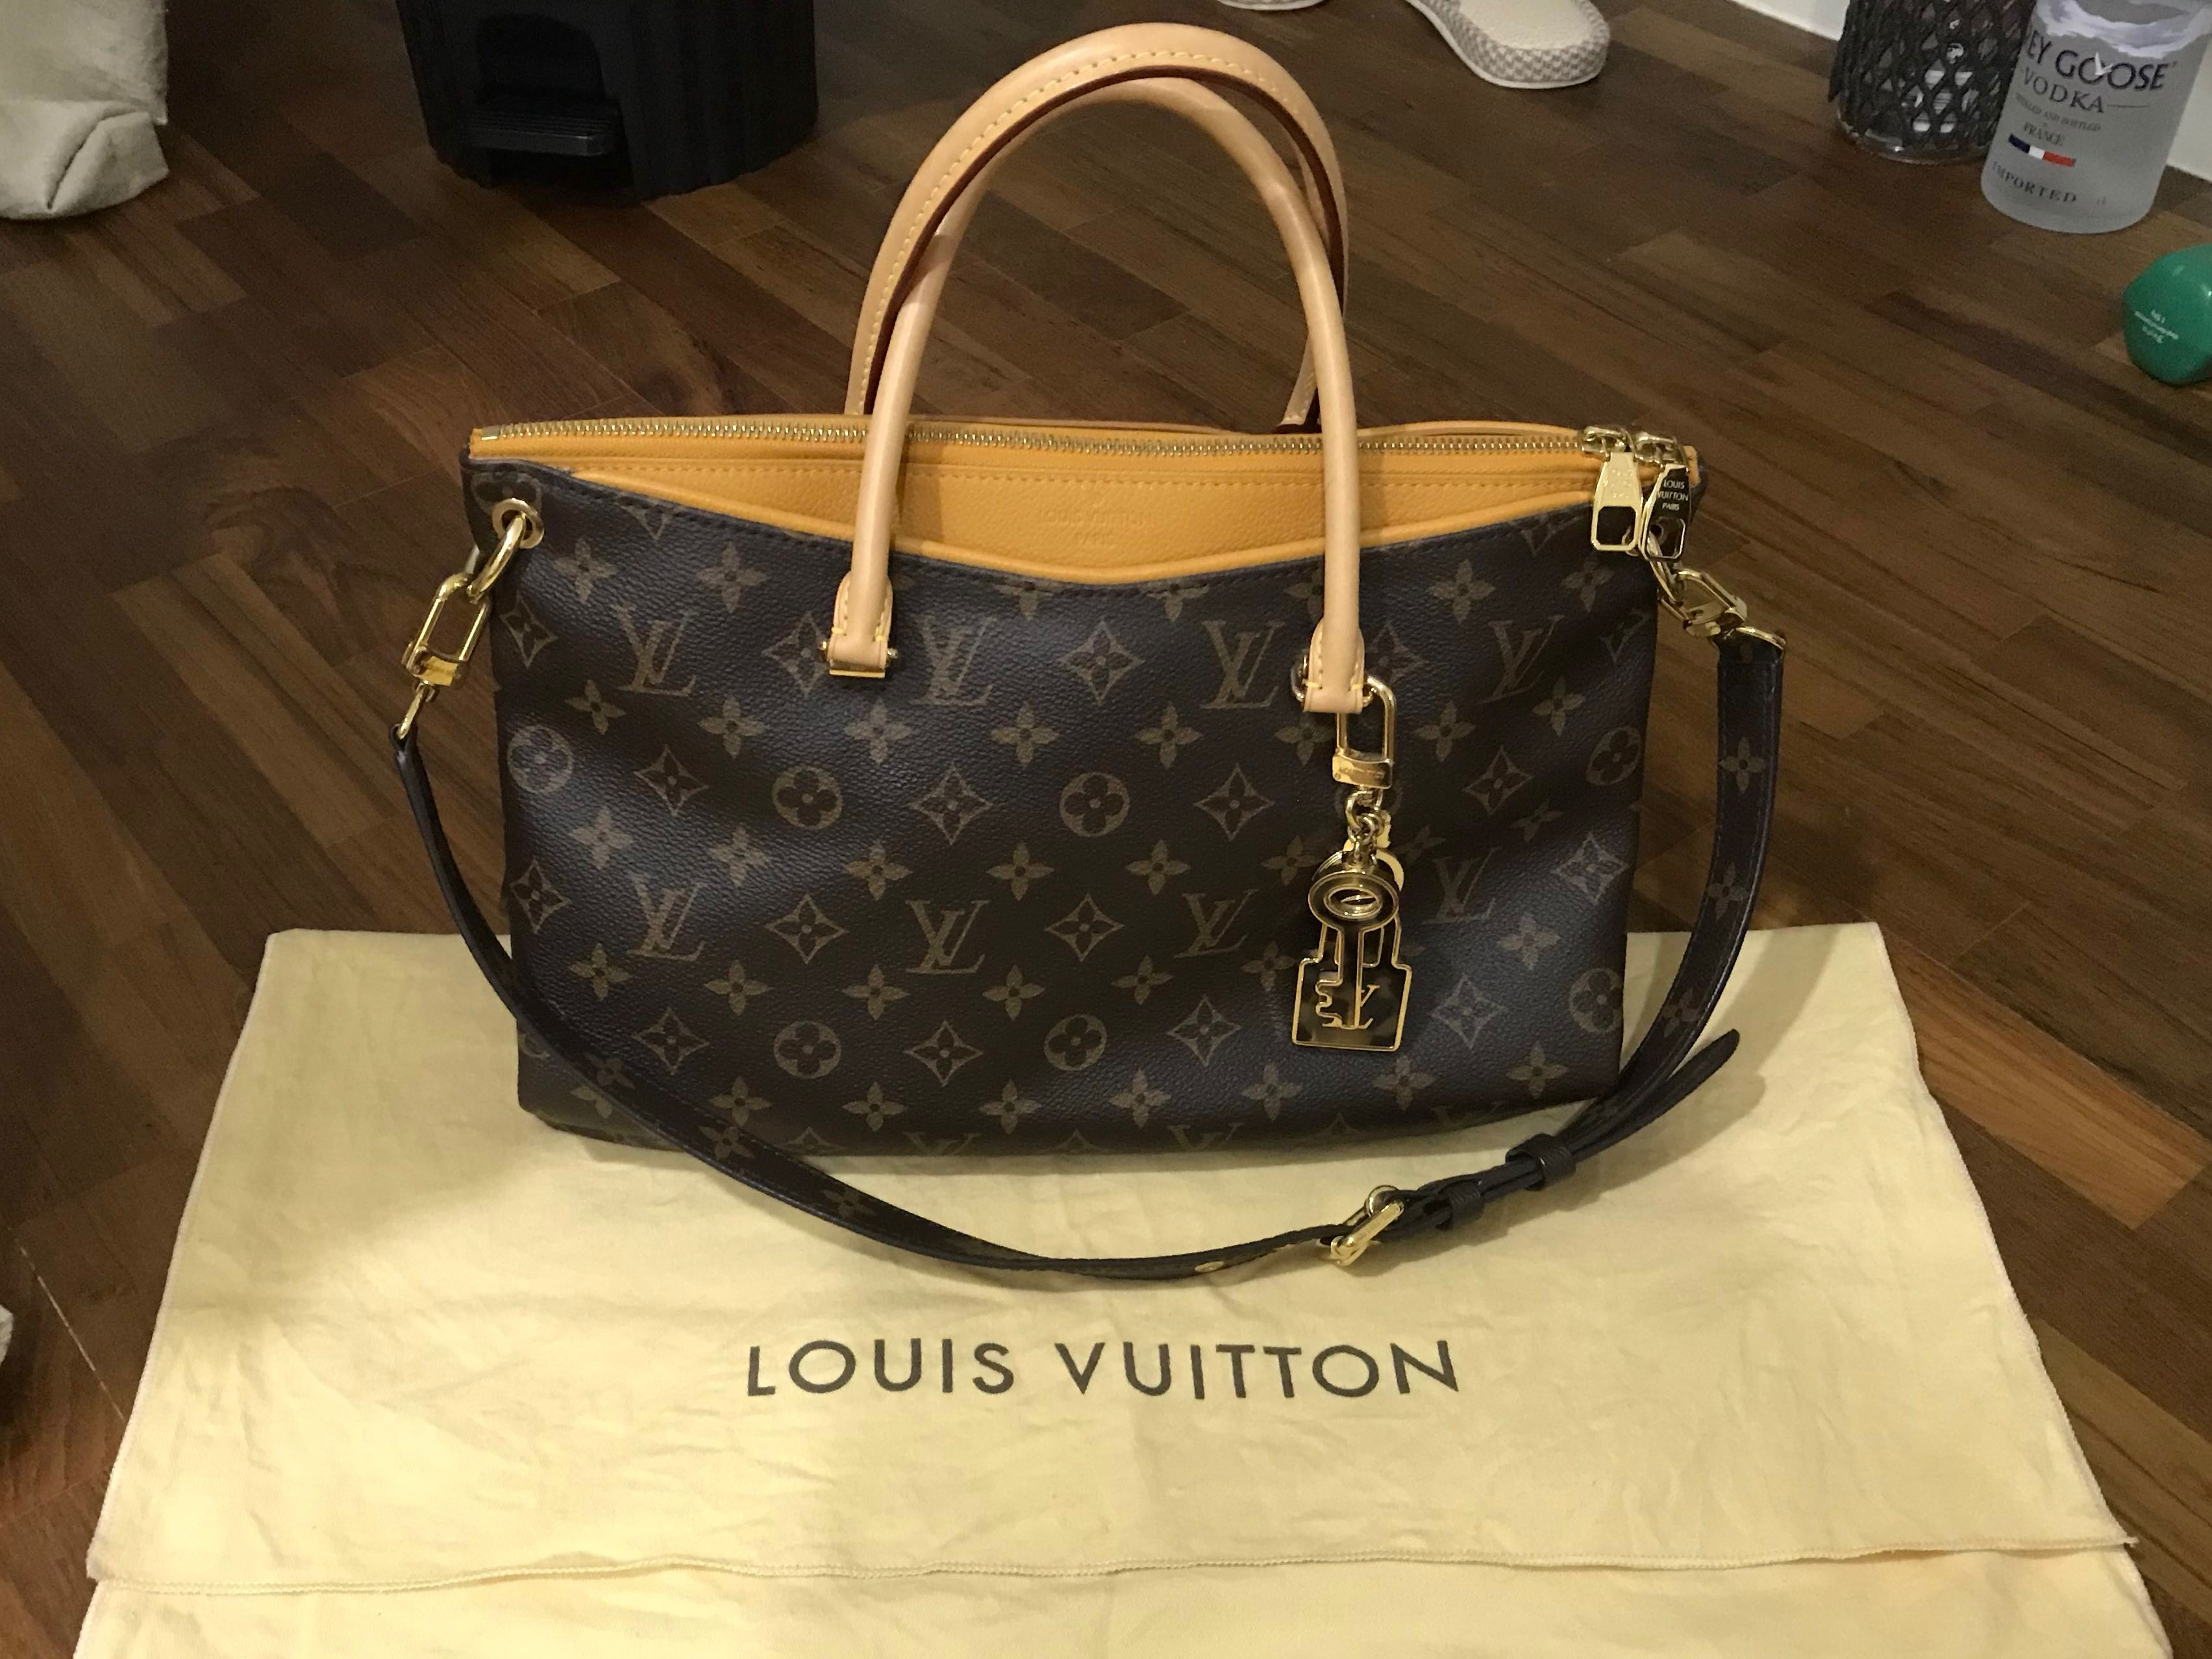 b0fd36db8b26 Louis Vuitton Authentic Handbags - Foto Handbag All Collections ...